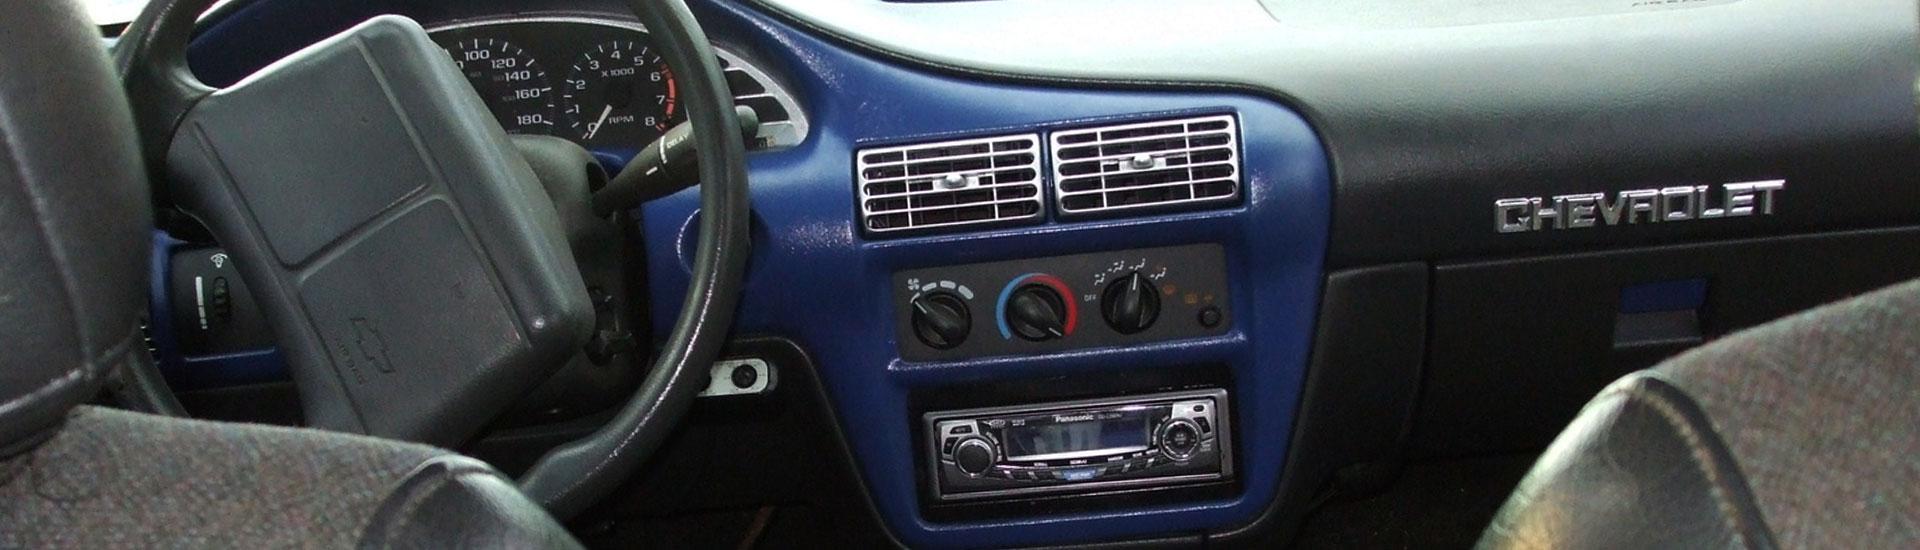 Chevrolet Cavalier Dash Kits Custom Chevrolet Cavalier